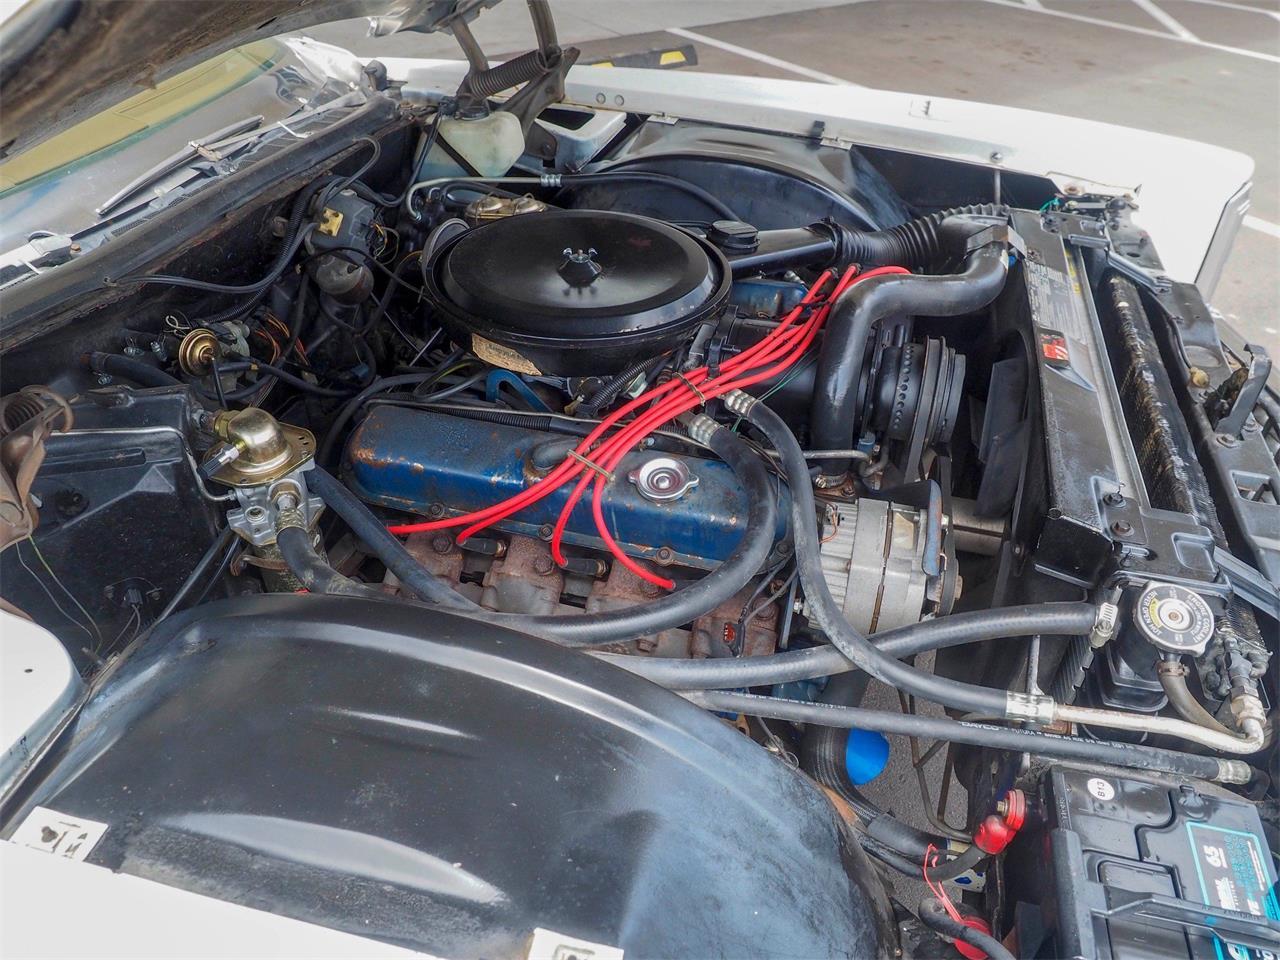 Large Picture of '76 Cadillac Eldorado located in Colorado - Q2GO